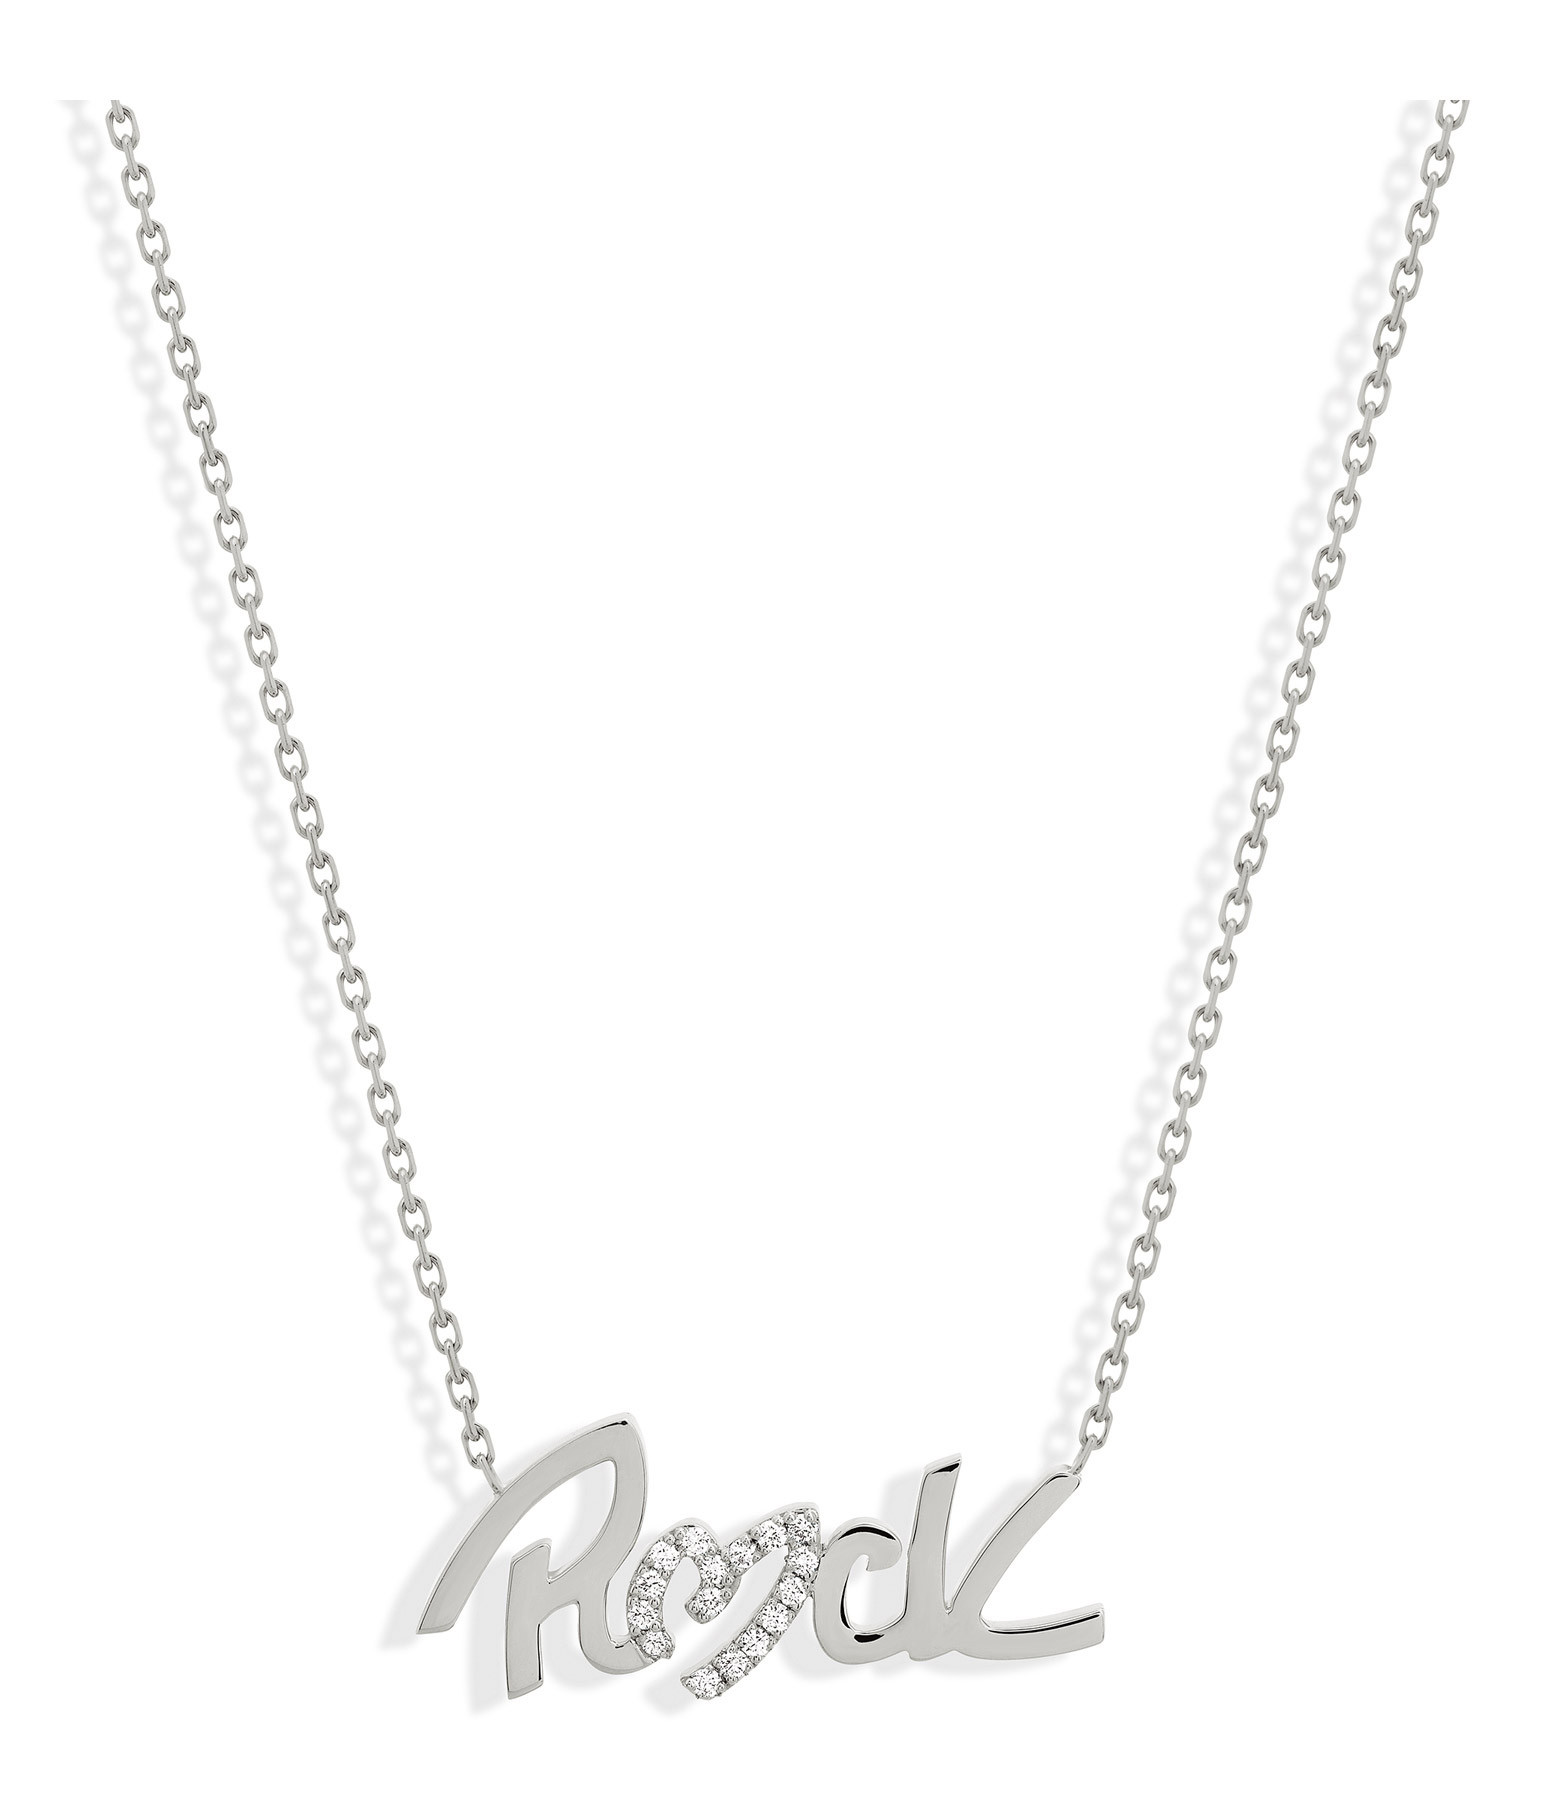 NAVA JOAILLERIE - Collier Rock Diamant Or Blanc